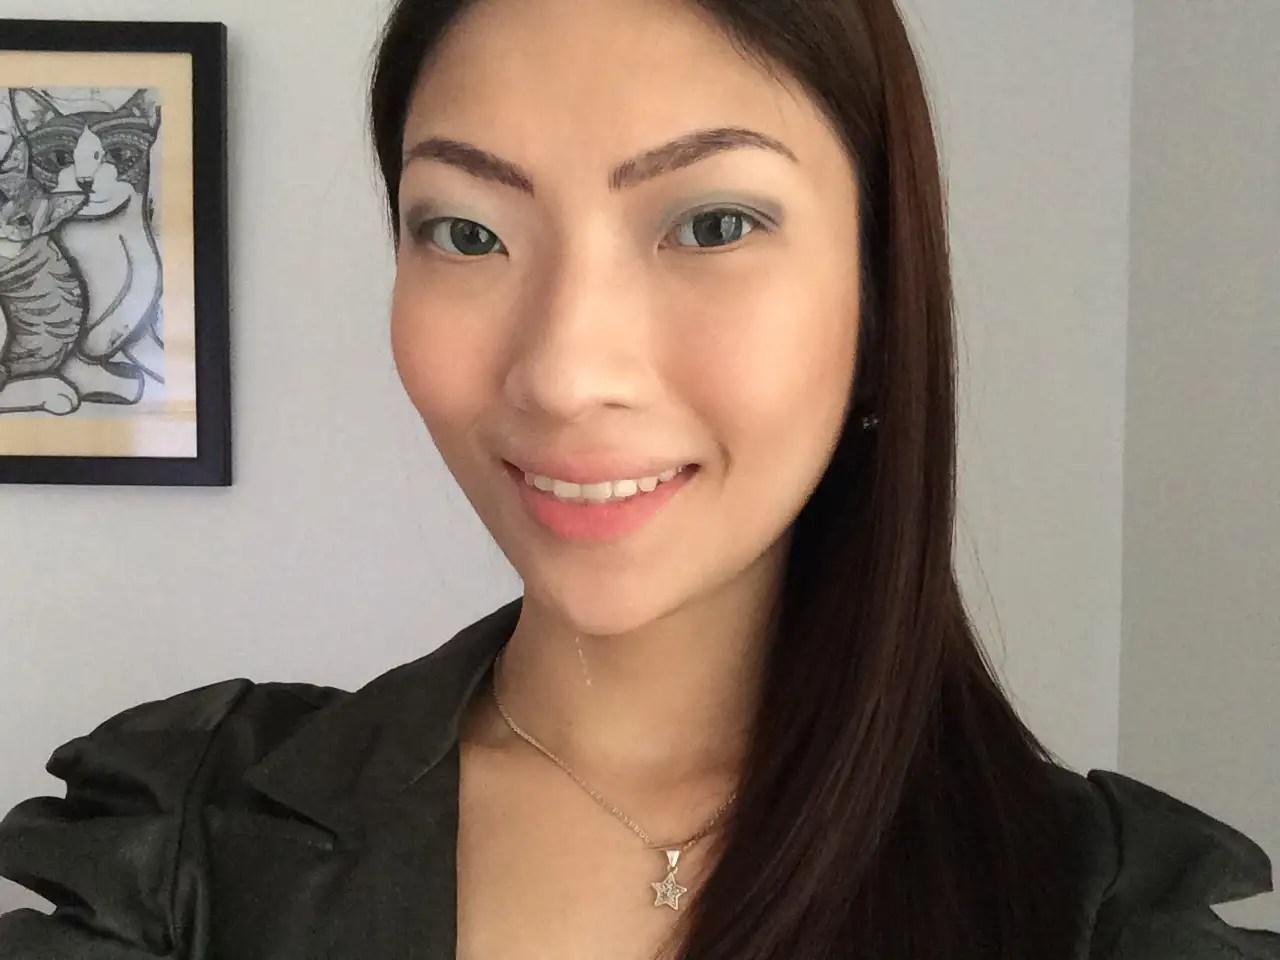 6656602e80f Couchwasabi | Asian Beauty & Lifestyle Blog – Page 168 – I'm a ninja ...